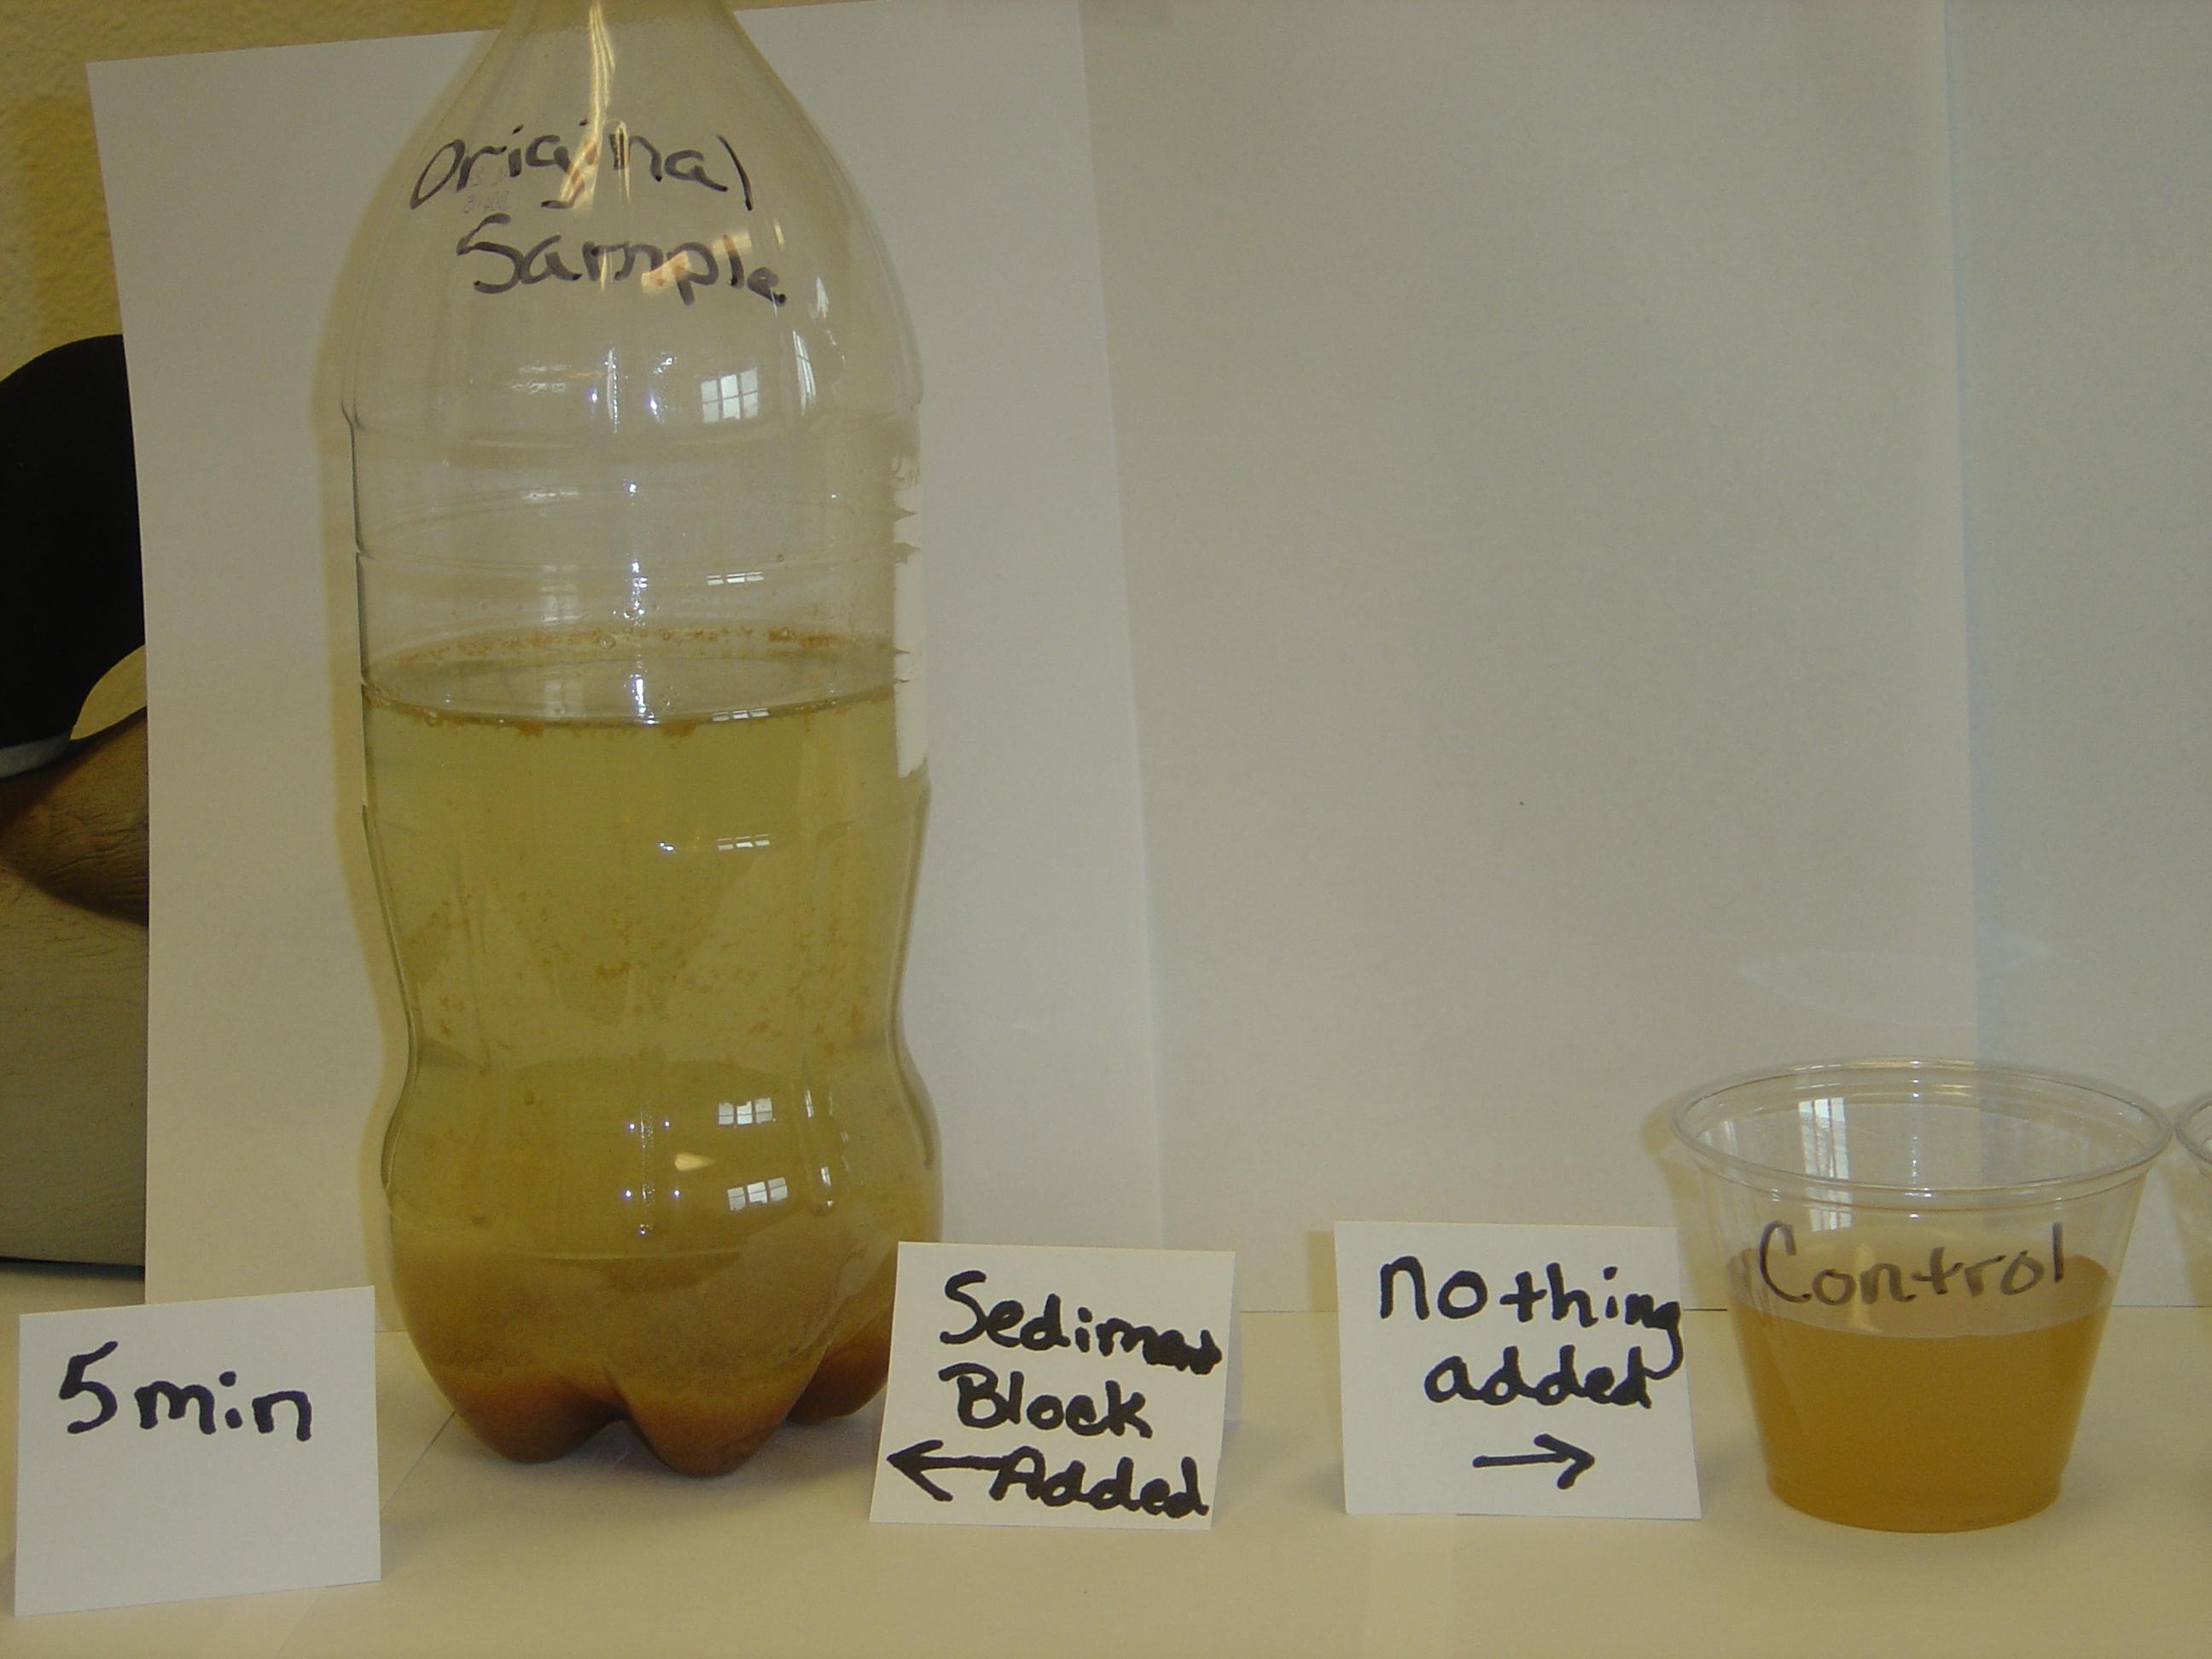 cd-94-k-sediment-block-testing-.jpg